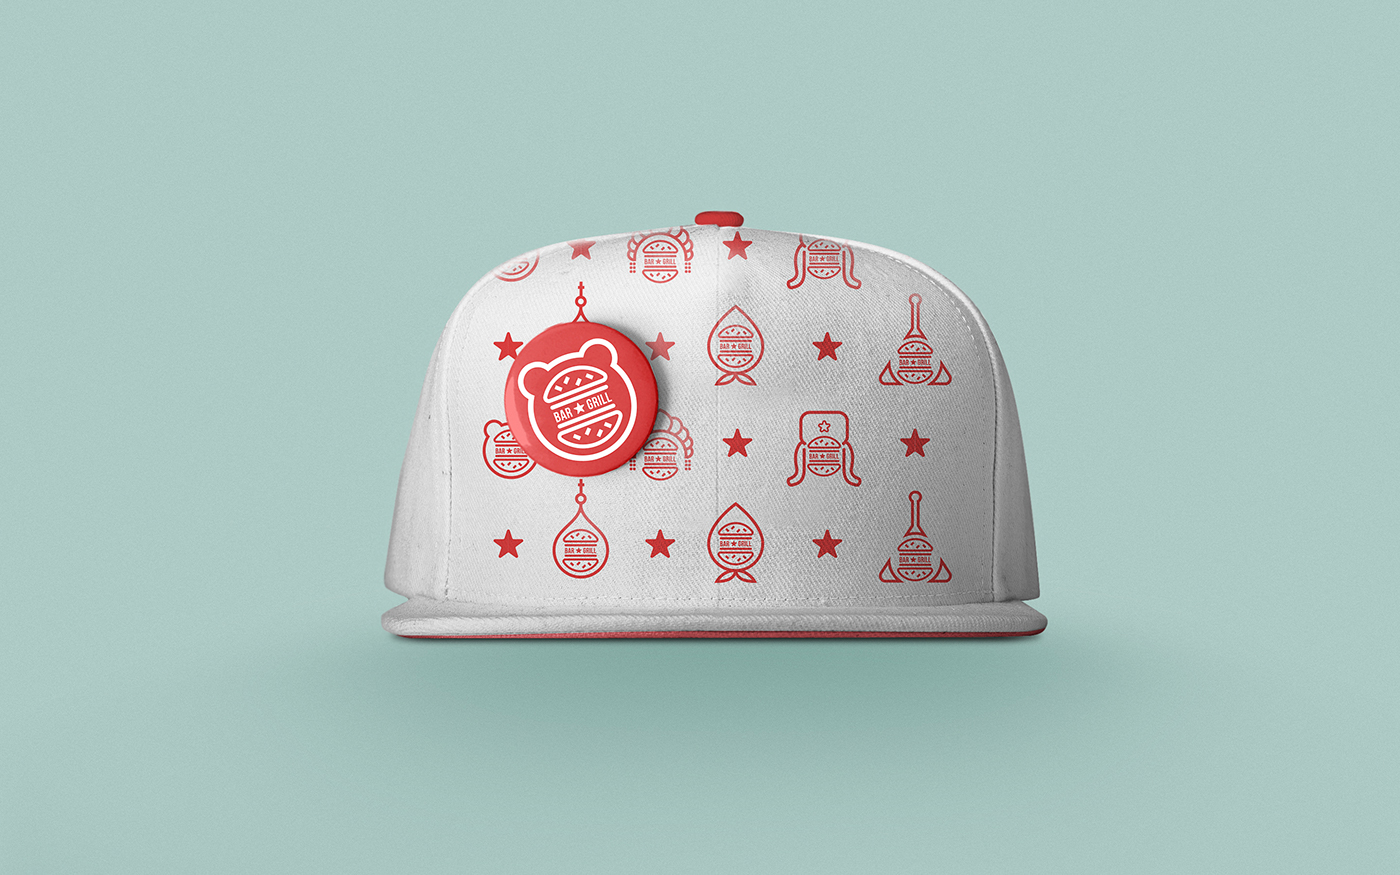 MOSBURG. Bar & Grill 品牌设计 – 国外品牌设计案例精选 - 任刚 · Ren Gang 世界设计 · 设计世界